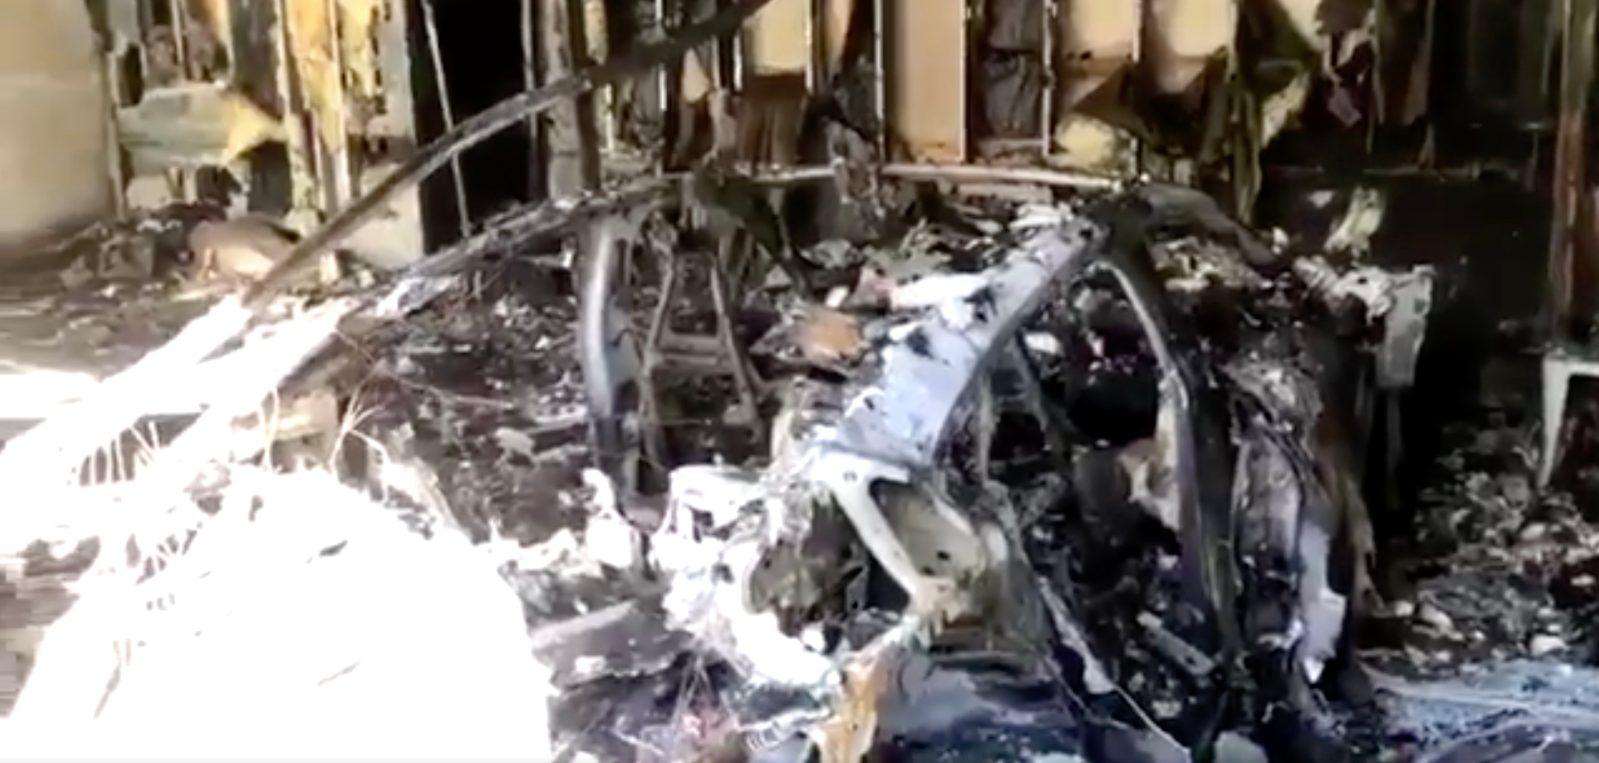 Porsche Taycan caught on fire — burning down a garage in Florida